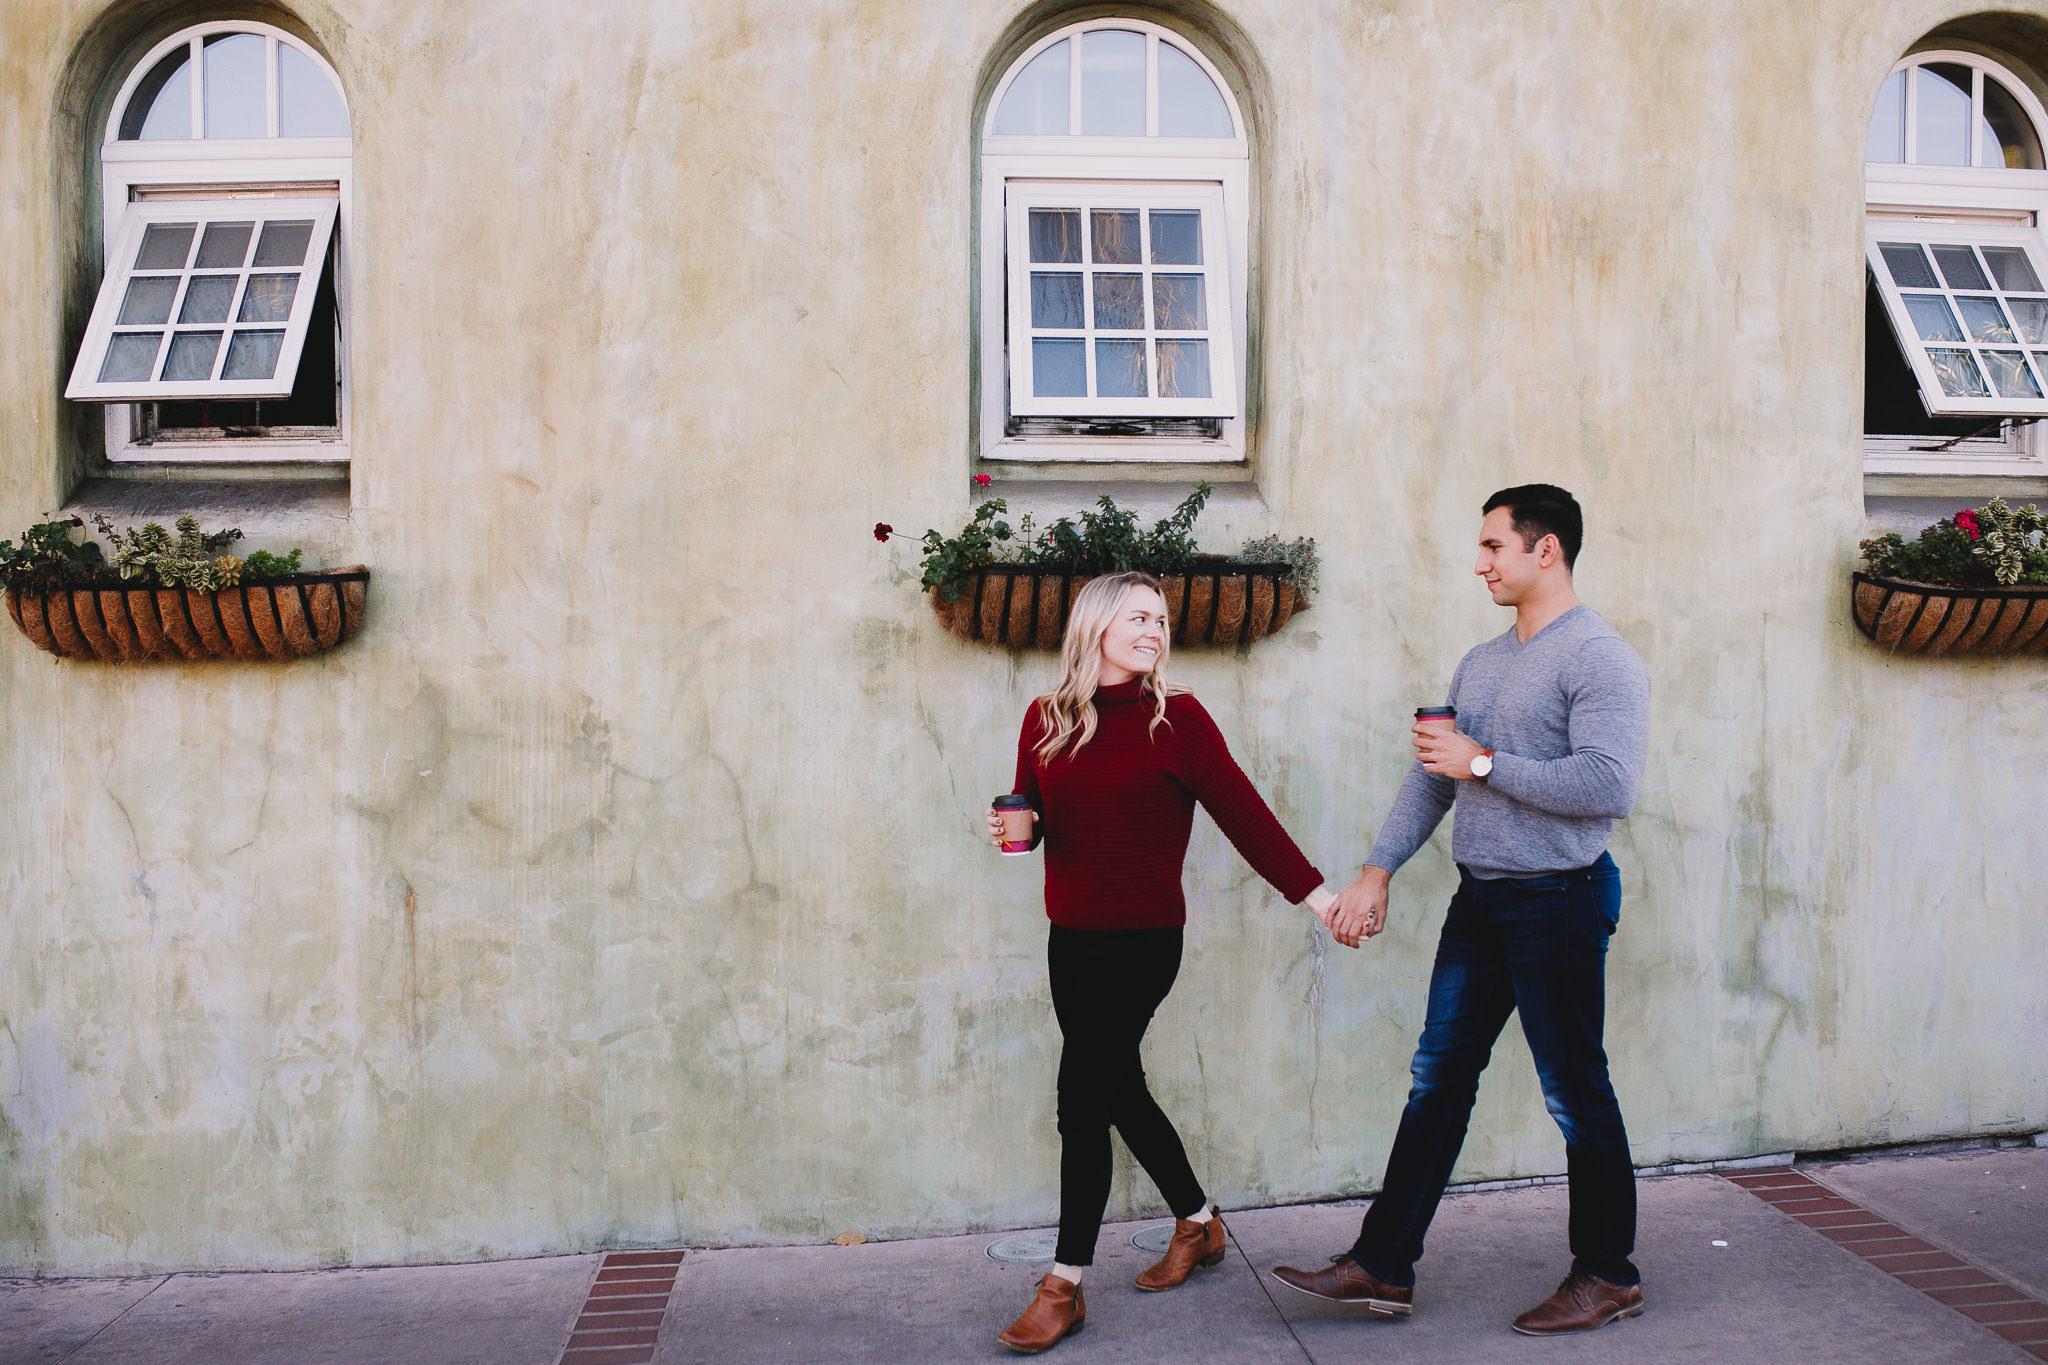 Archer Inspired Photography Capitola Beach Santa Cruz Wedding Engagement Lifestyle Session Photographer-14.jpg